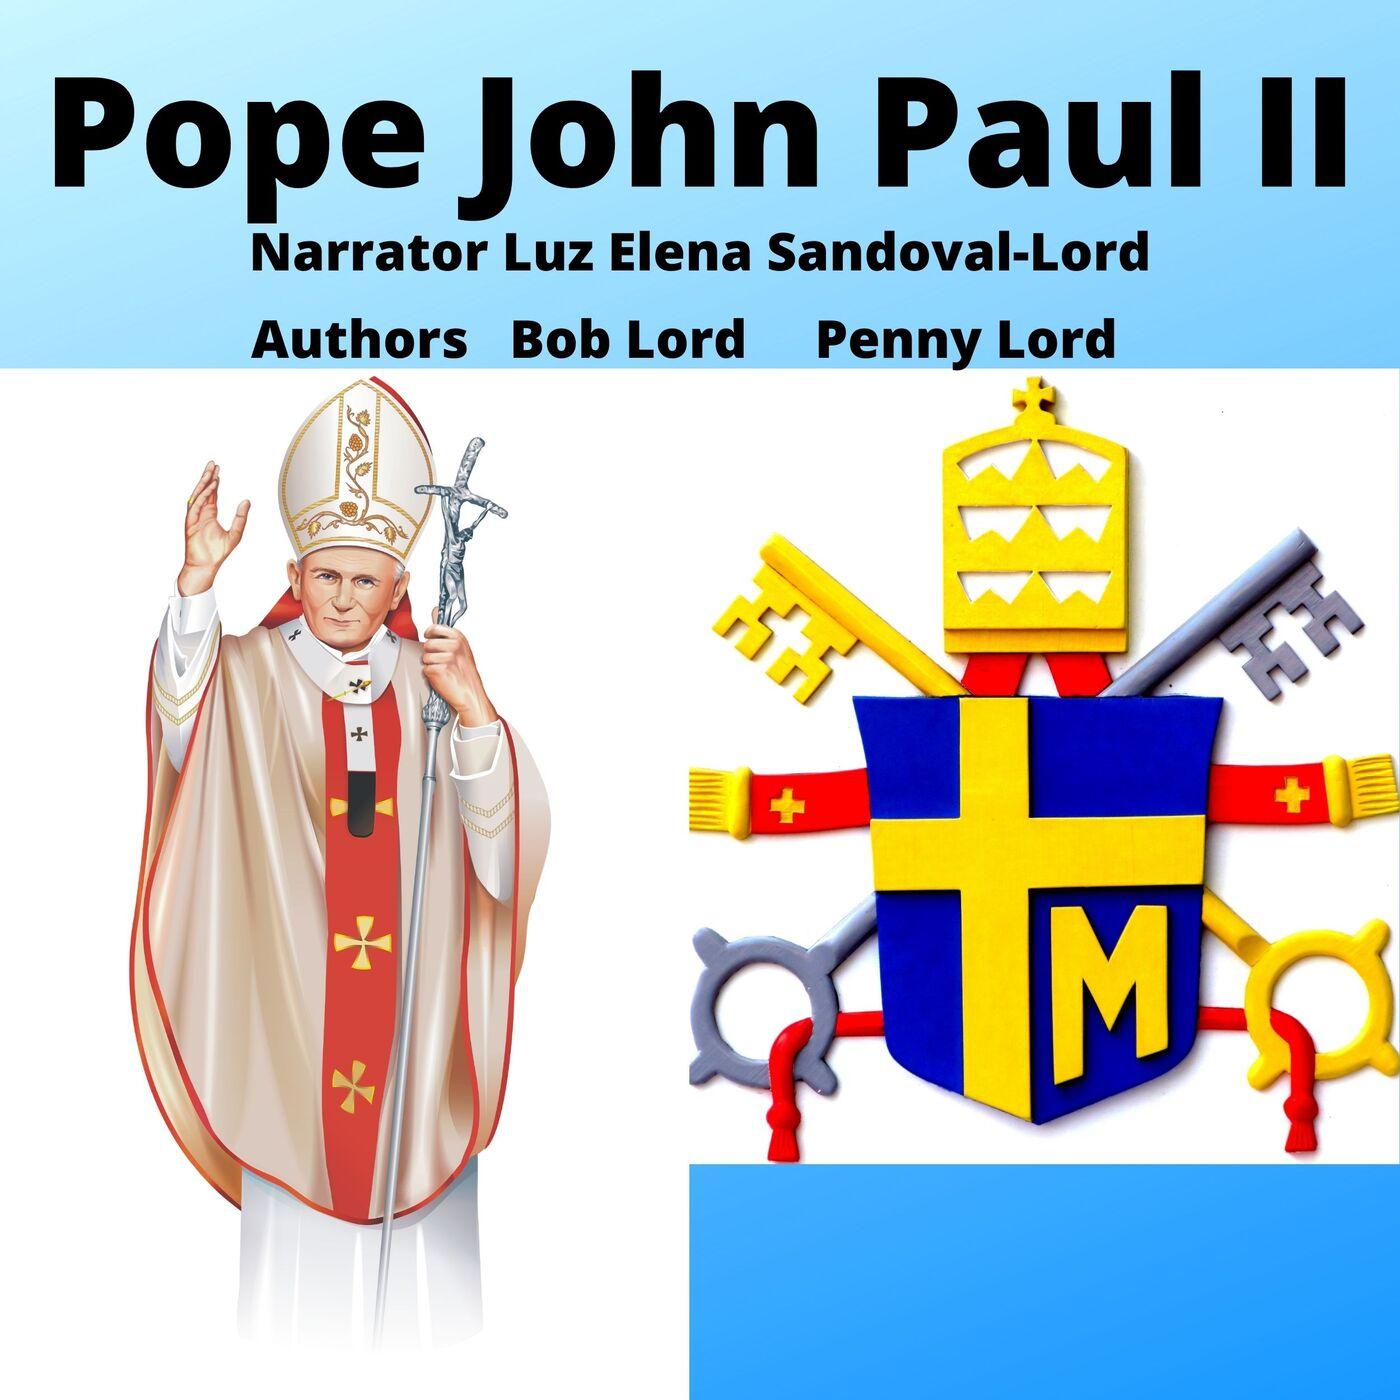 Saint Pope John Paul II Feast day October 22